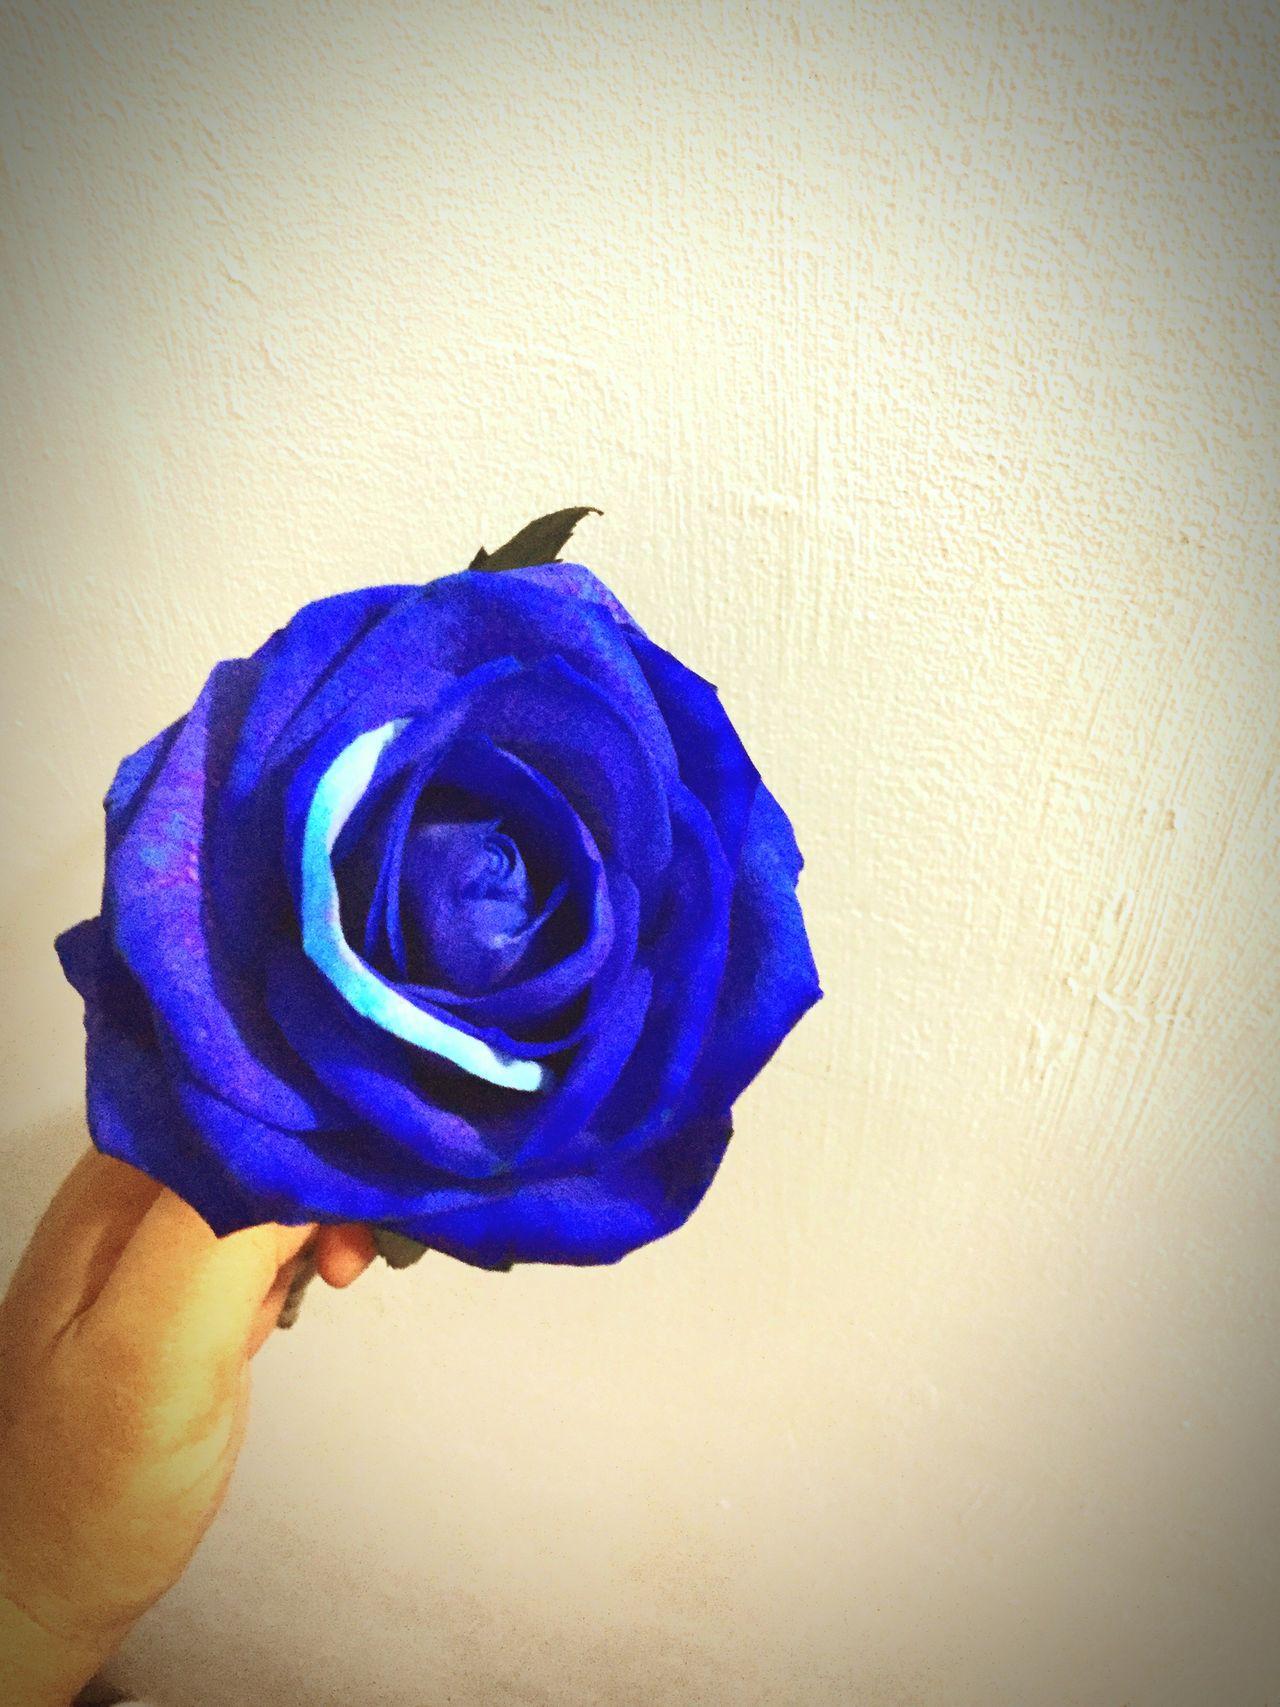 Rose🌹 Blue Beautiful Flower Lovely Happy Teachers Day